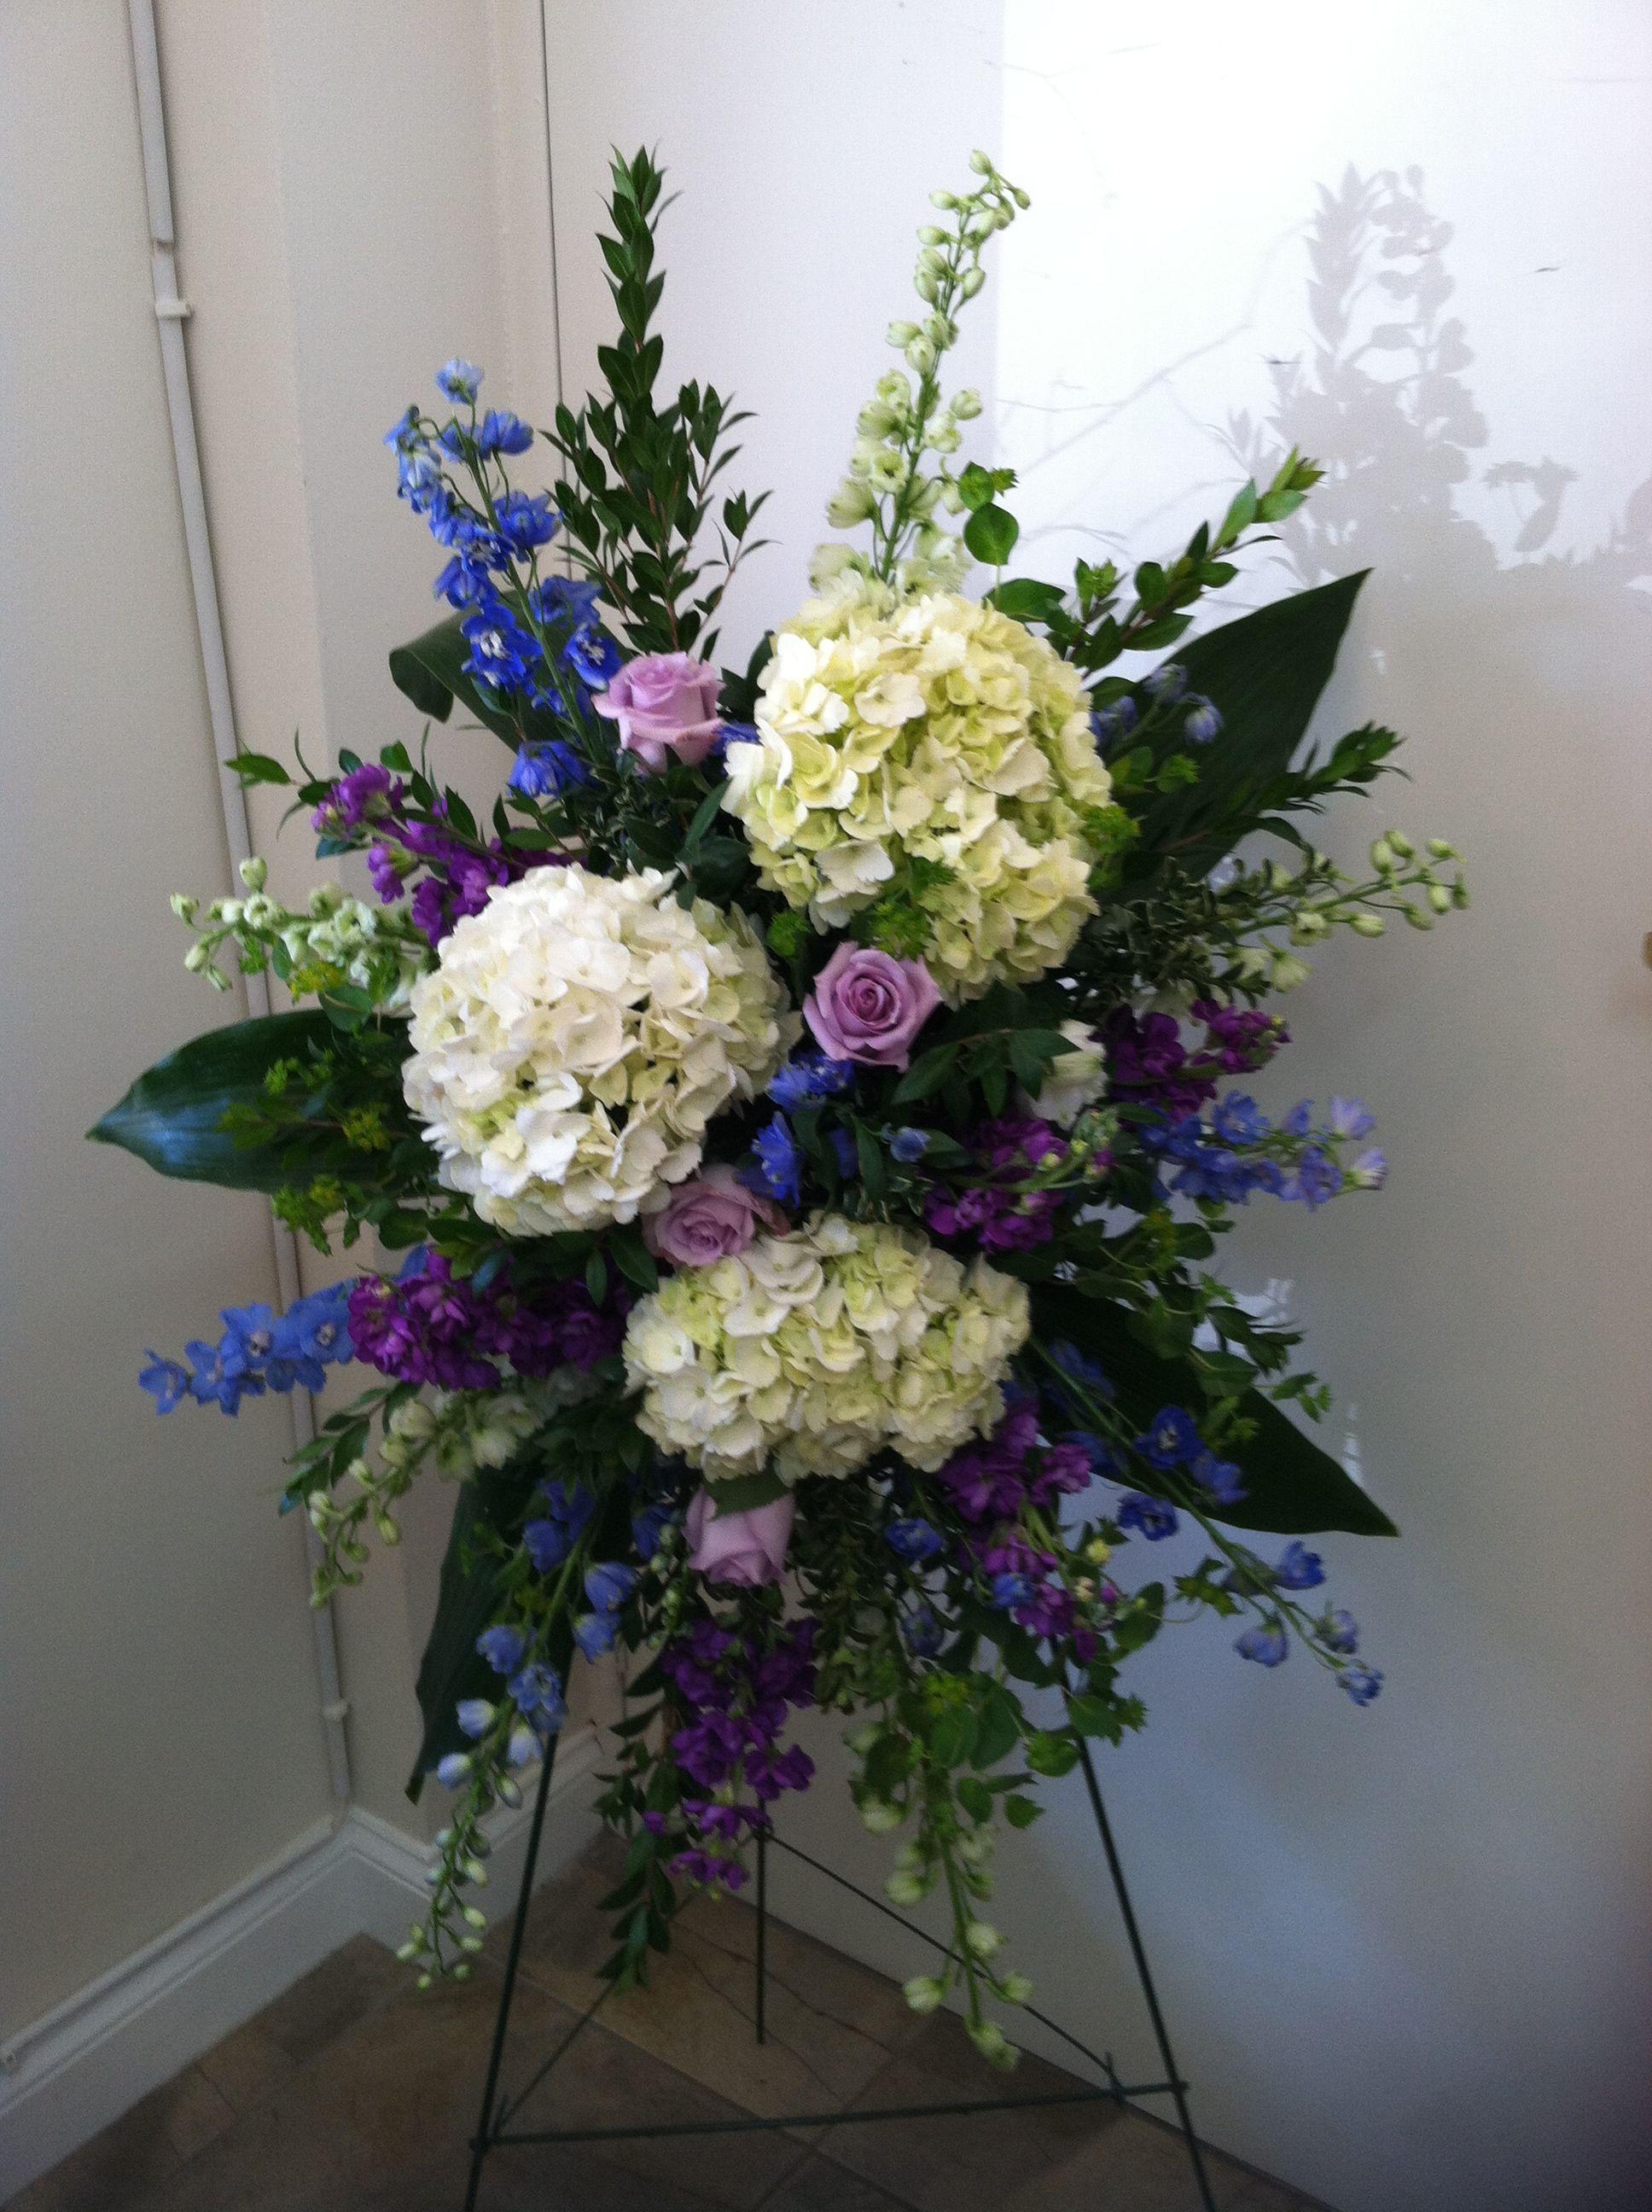 Blue White Silver Casket Spray Funeral Flowers With Hydrangeas Roses Delphinium Cowboys Inspir Casket Sprays Funeral Flower Arrangements Funeral Flowers